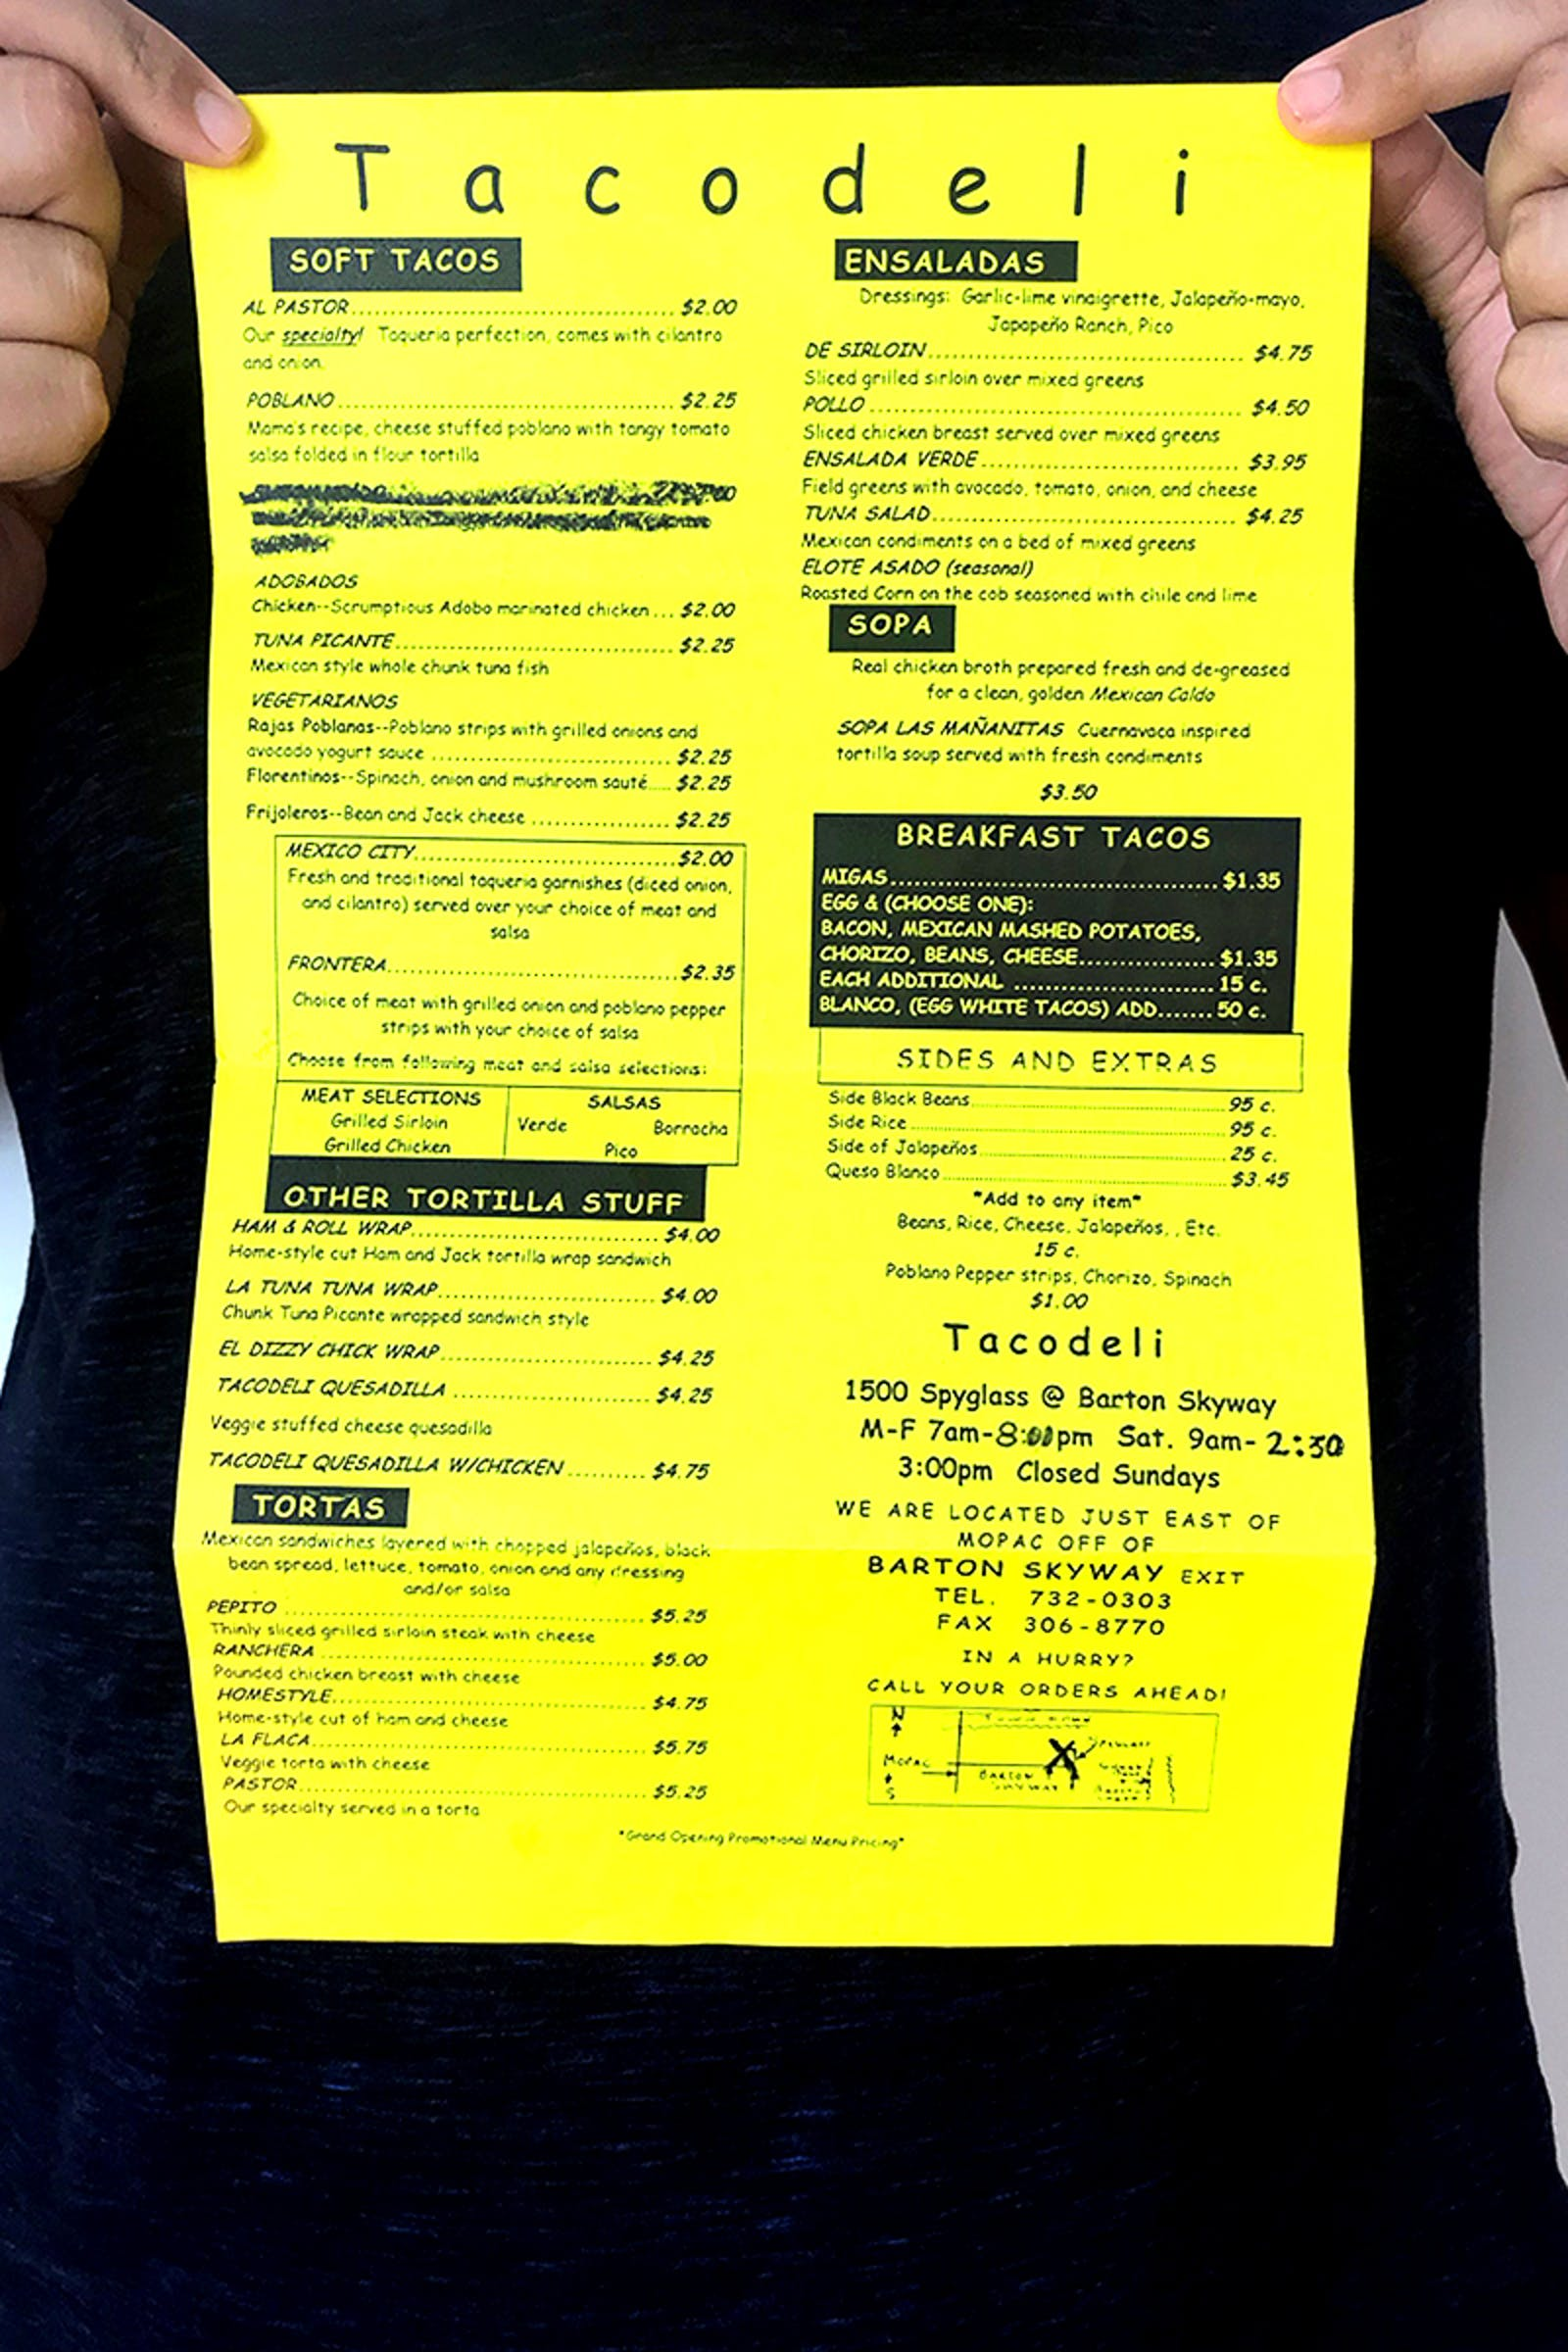 Tacodeli menu.